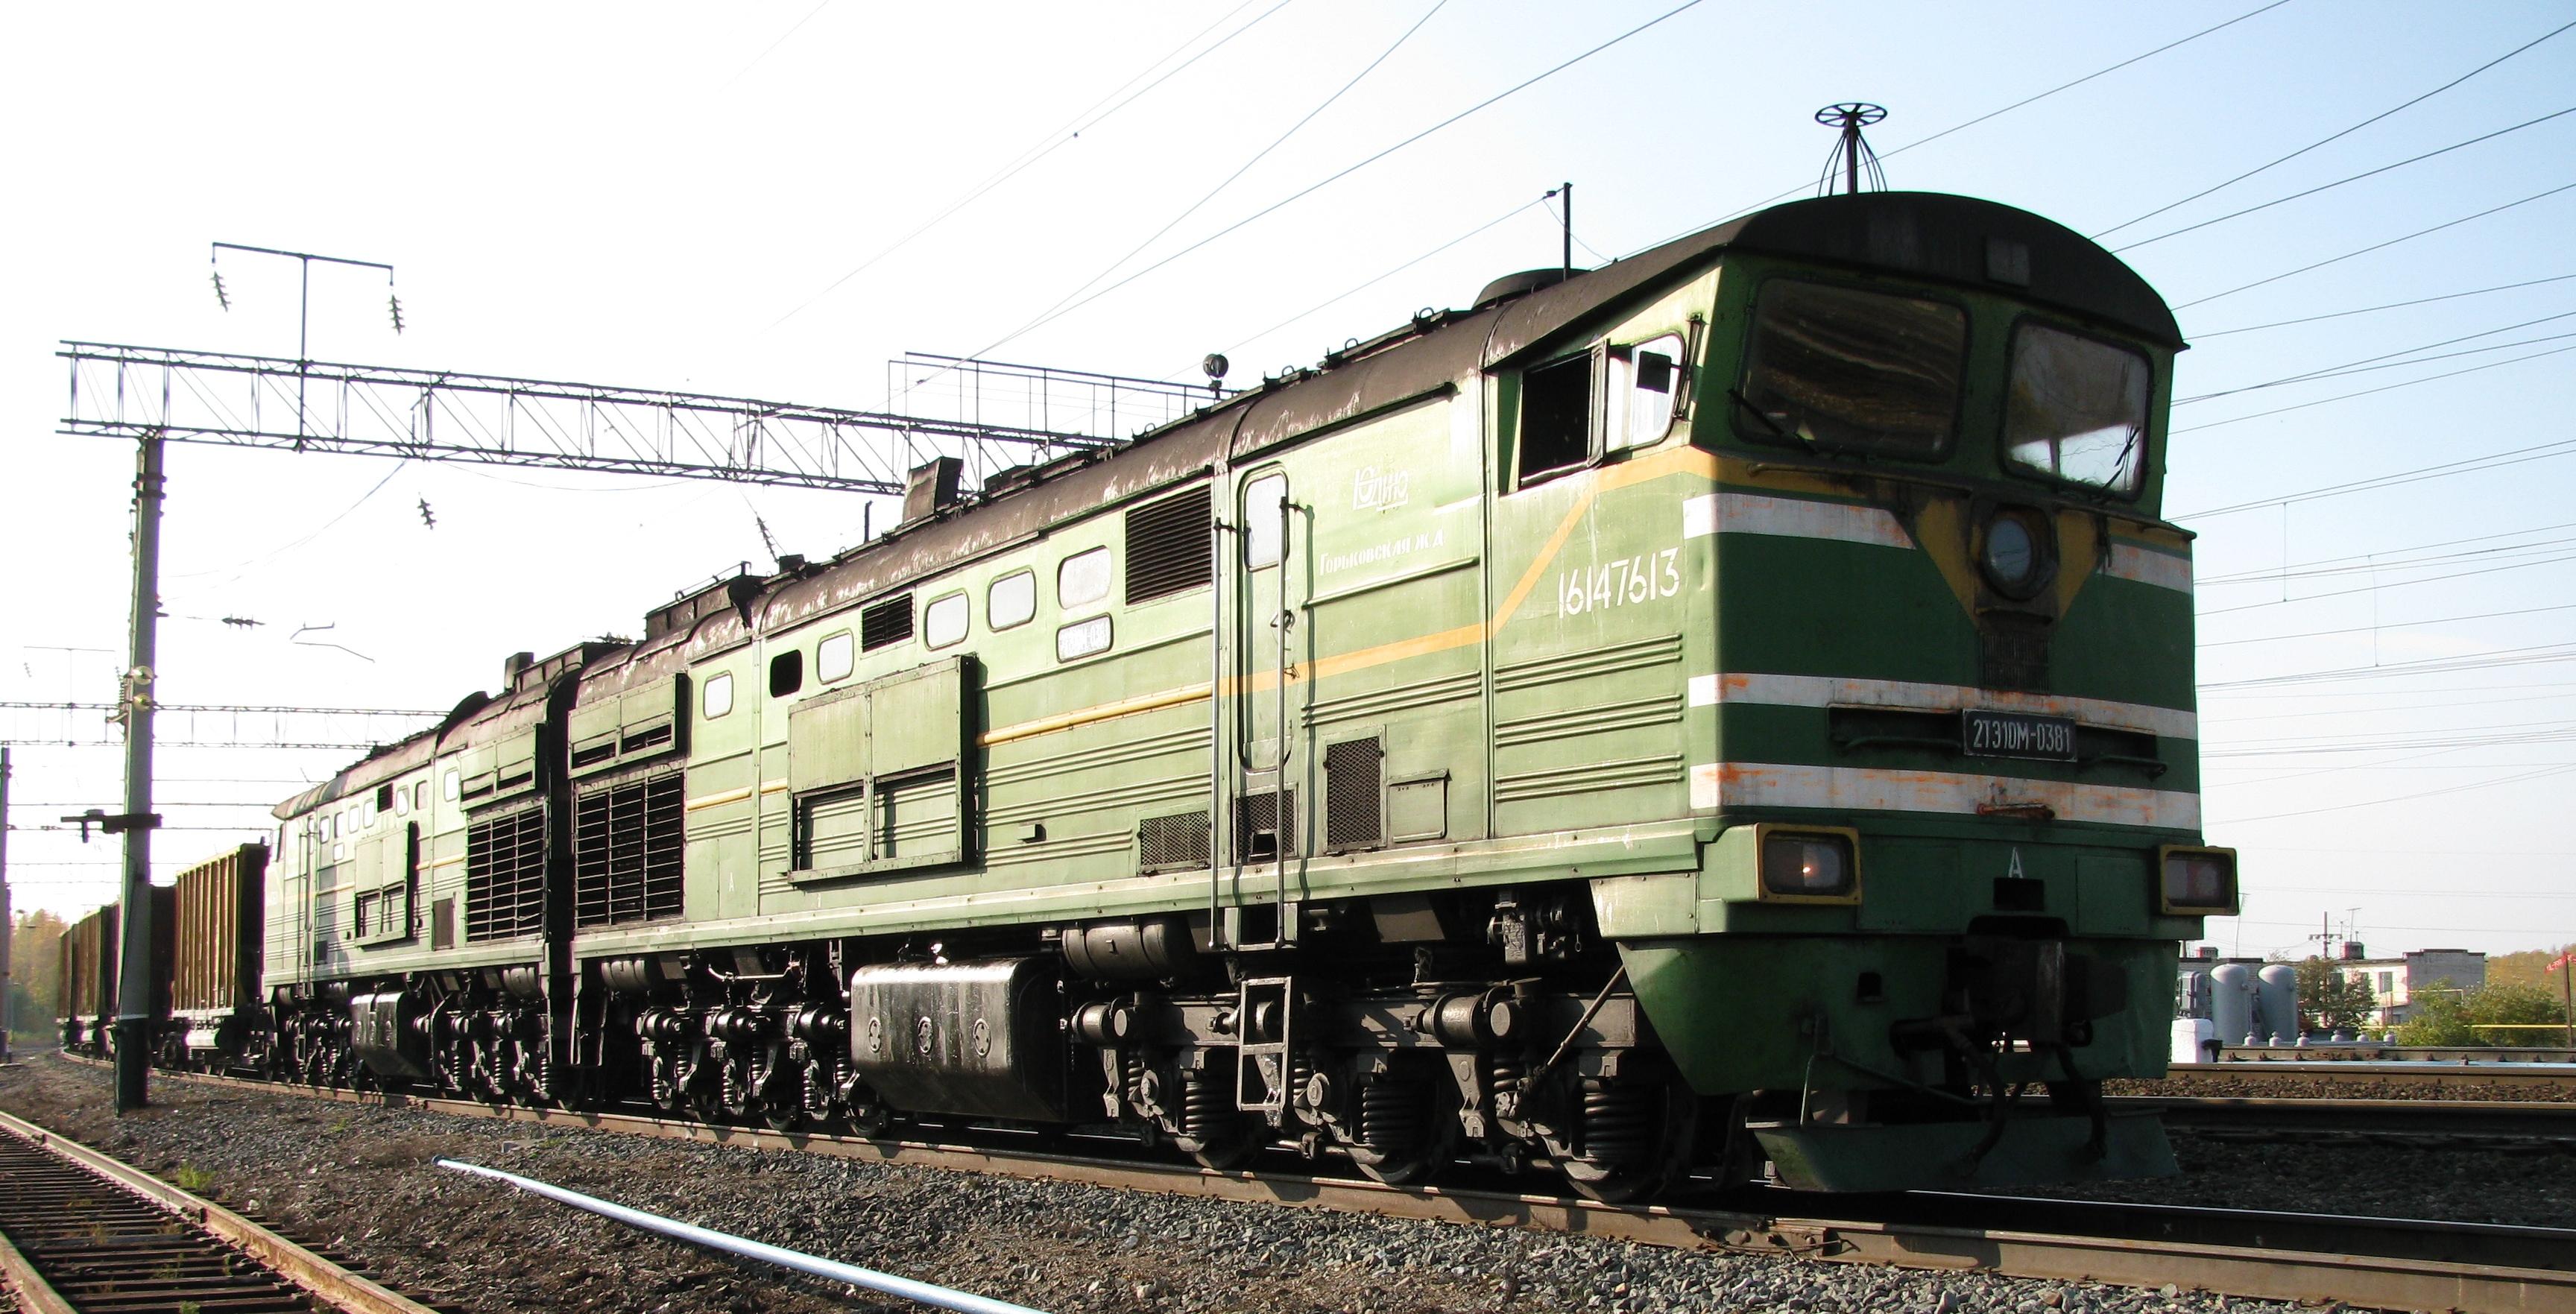 Обзор локомотива 2тэ10м-3141 для train simulator 2017 youtube.